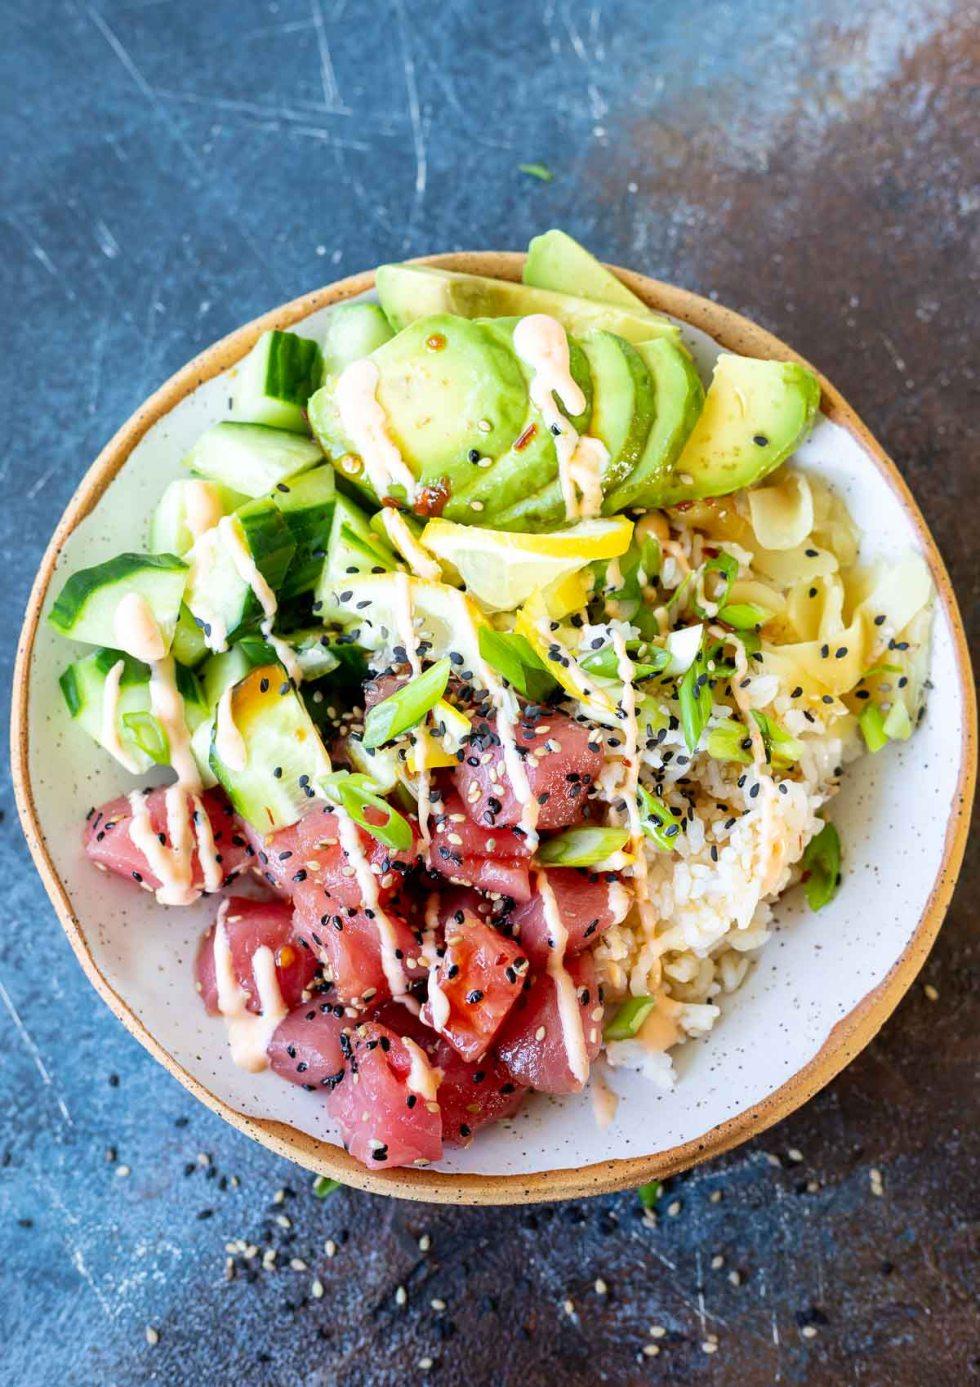 prepared tuna poke served in white speckled bowl